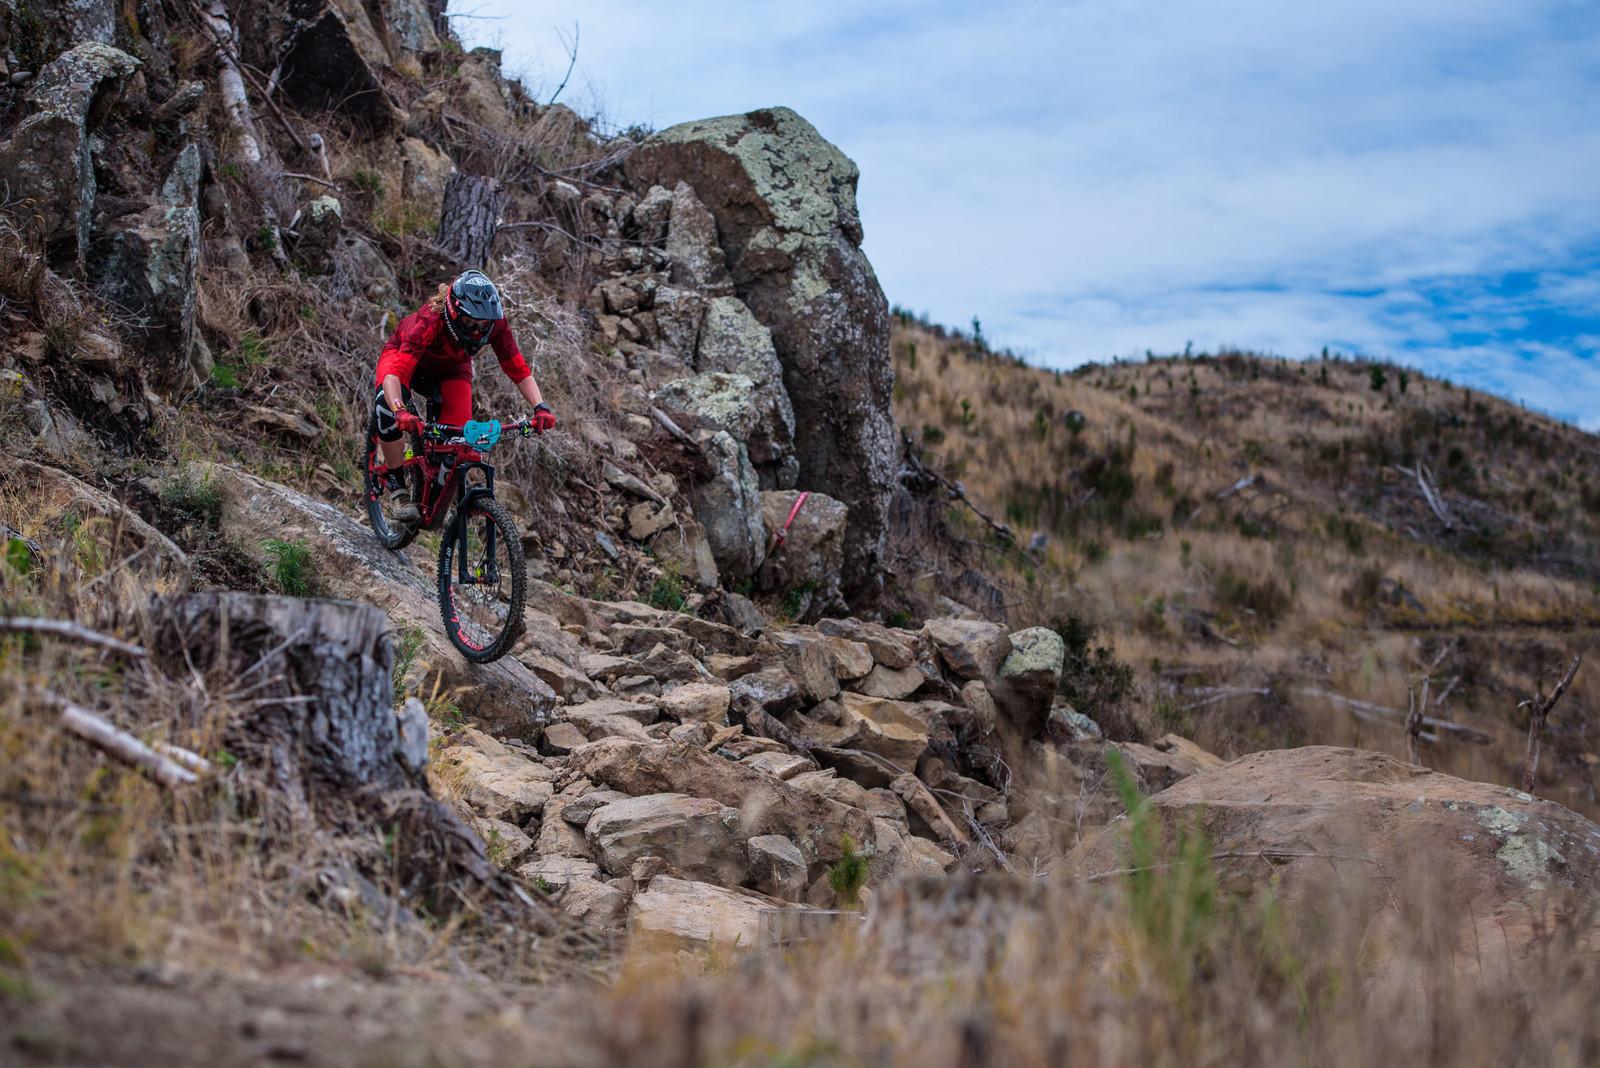 NZenduro19 day 3 DShaw-8537 - 2019 NZ Enduro Day 3 Photo Gallery - Mountain Biking Pictures - Vital MTB